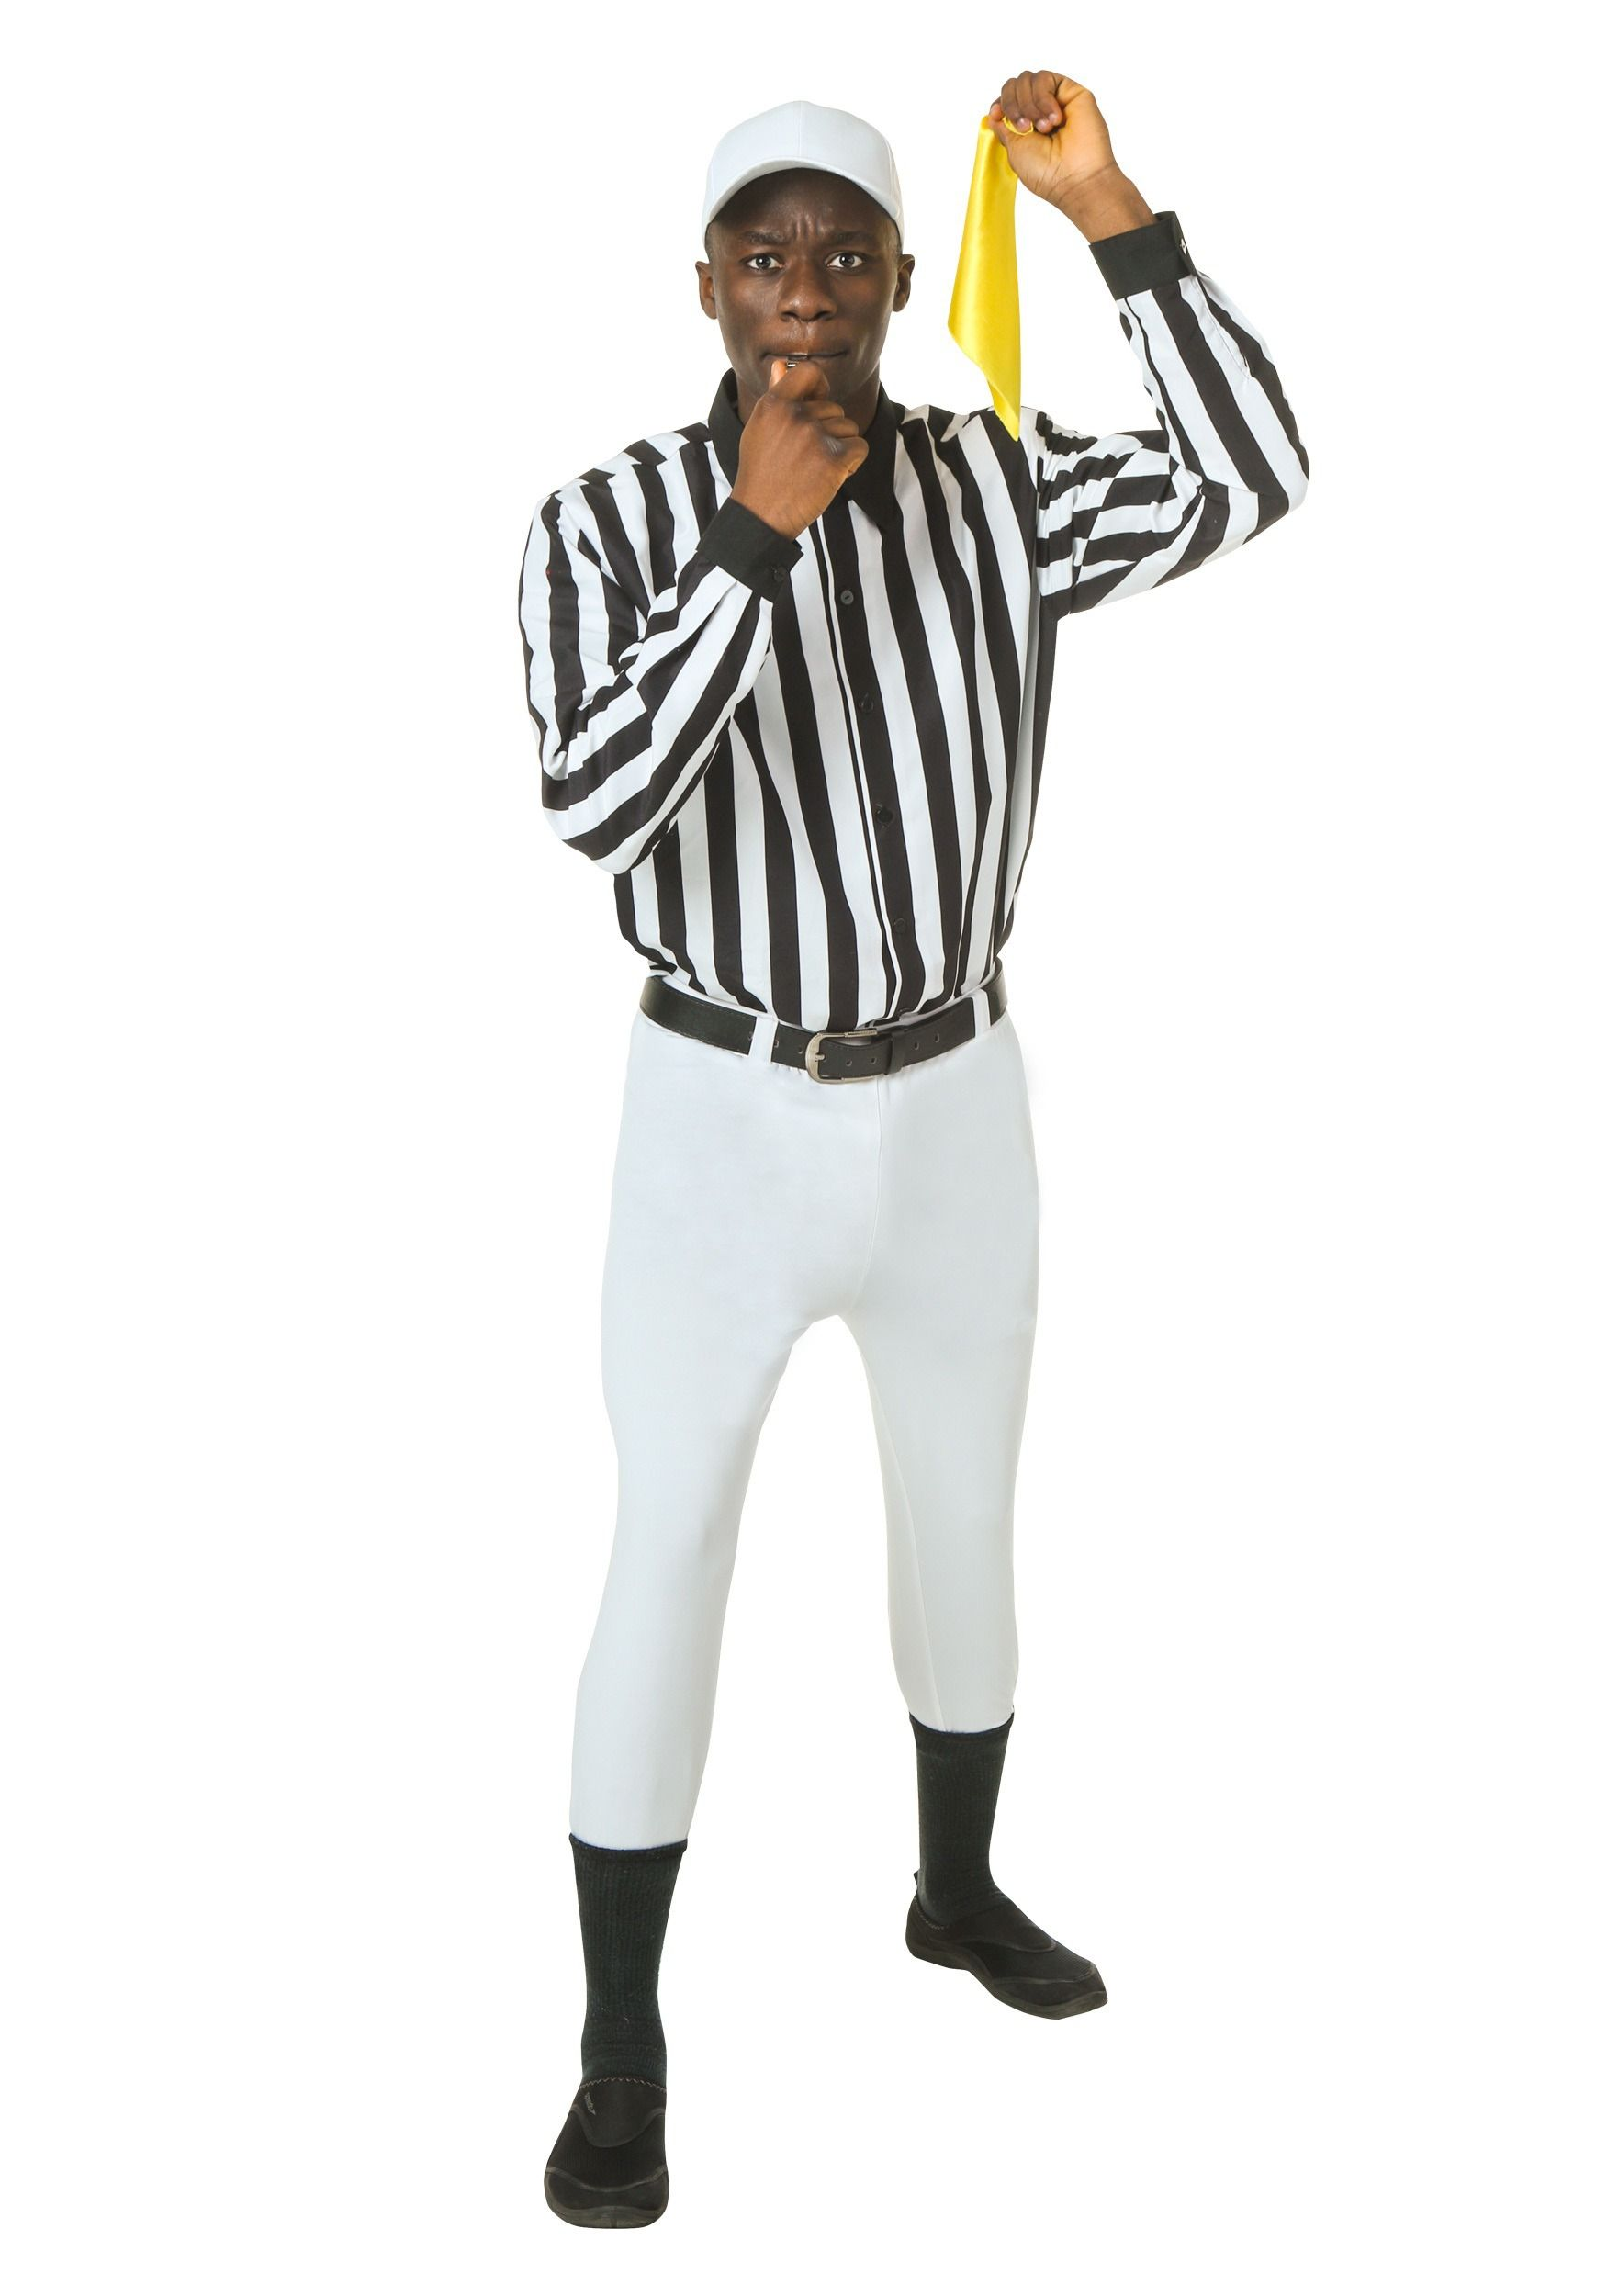 Plus Size Referee Costume | Plus Size Halloween Costumes | Pinterest ...